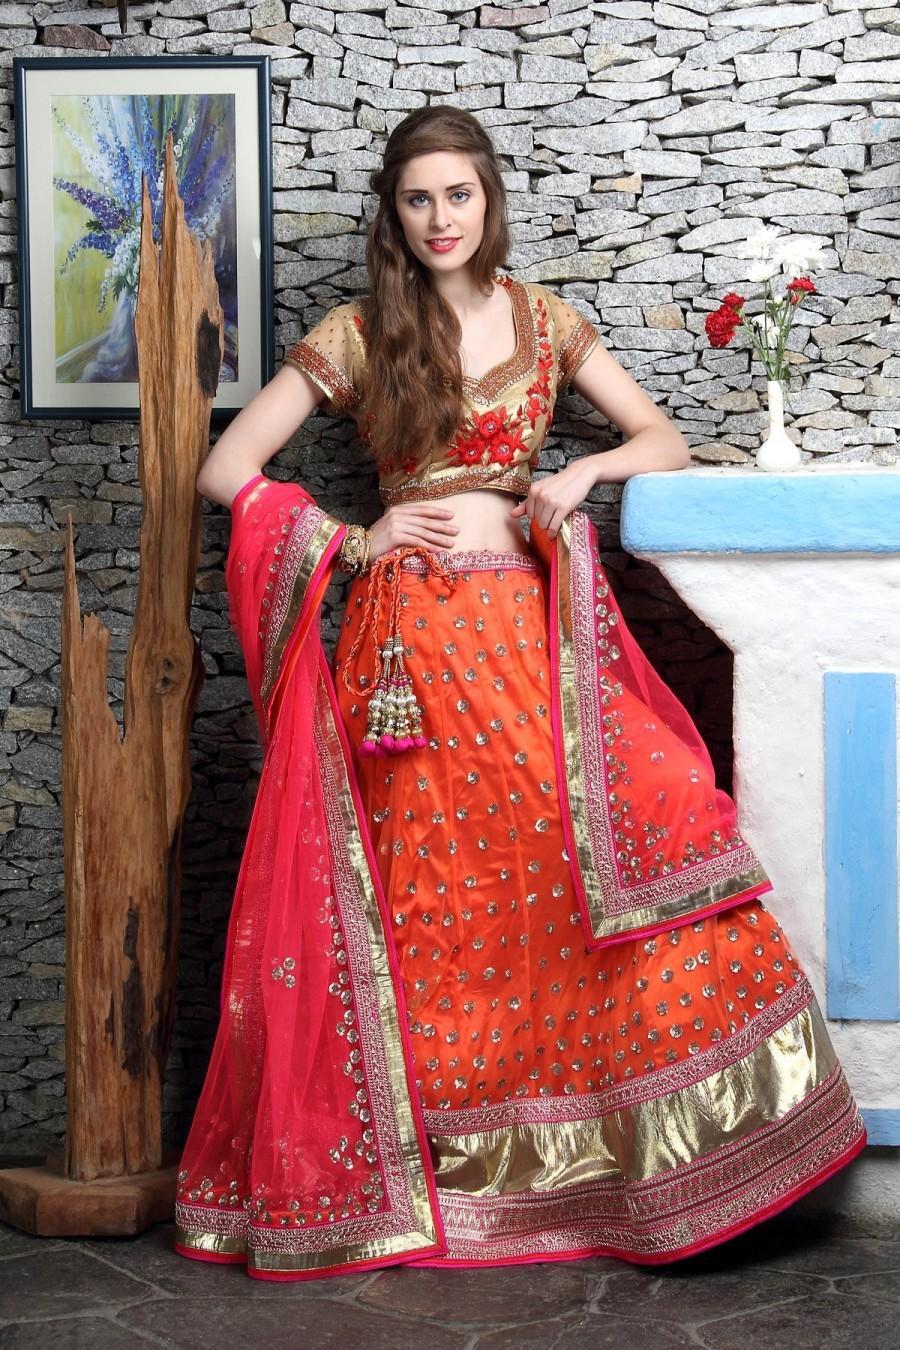 Hochzeit - Neon Orange & Rani Pink Lehenga with sequins work